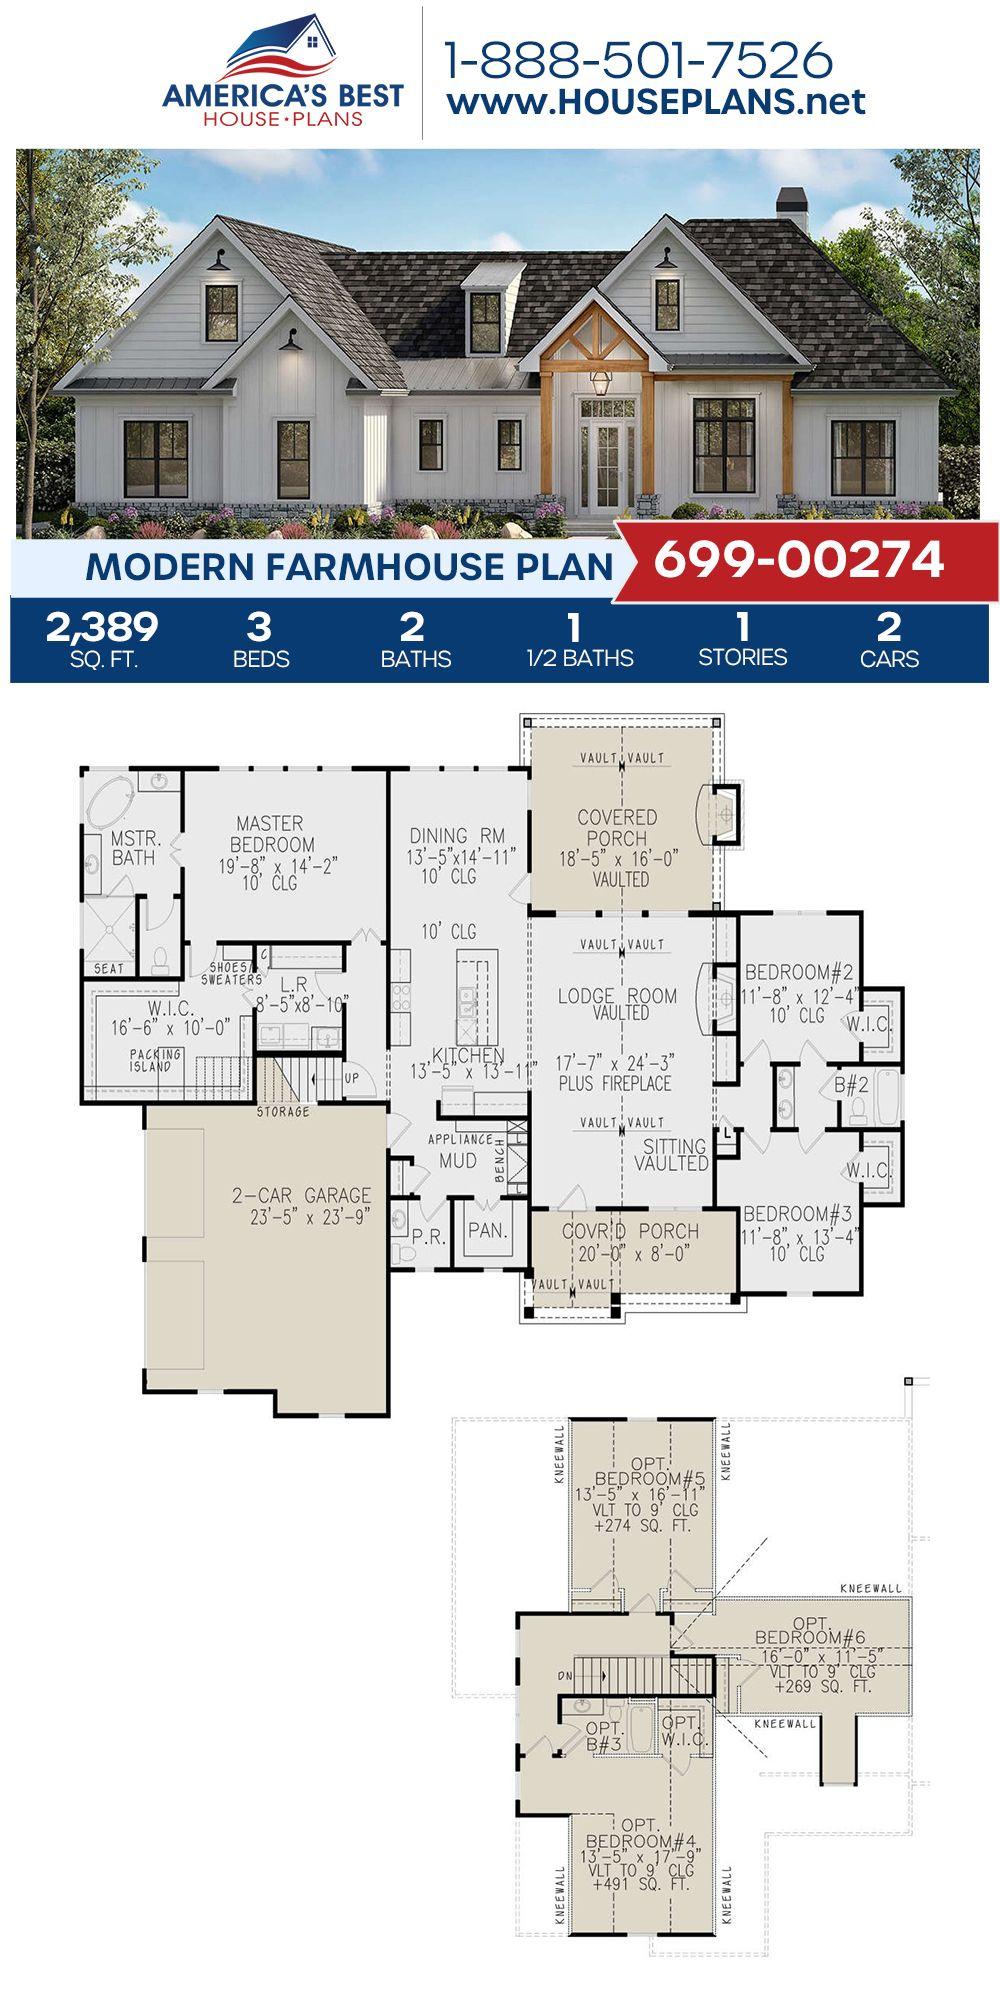 House Plan 699 00274 Modern Farmhouse Plan 2 389 Square Feet 3 Bedrooms 2 5 Bathrooms Modern Farmhouse Plans Farmhouse Plans House Plans Farmhouse